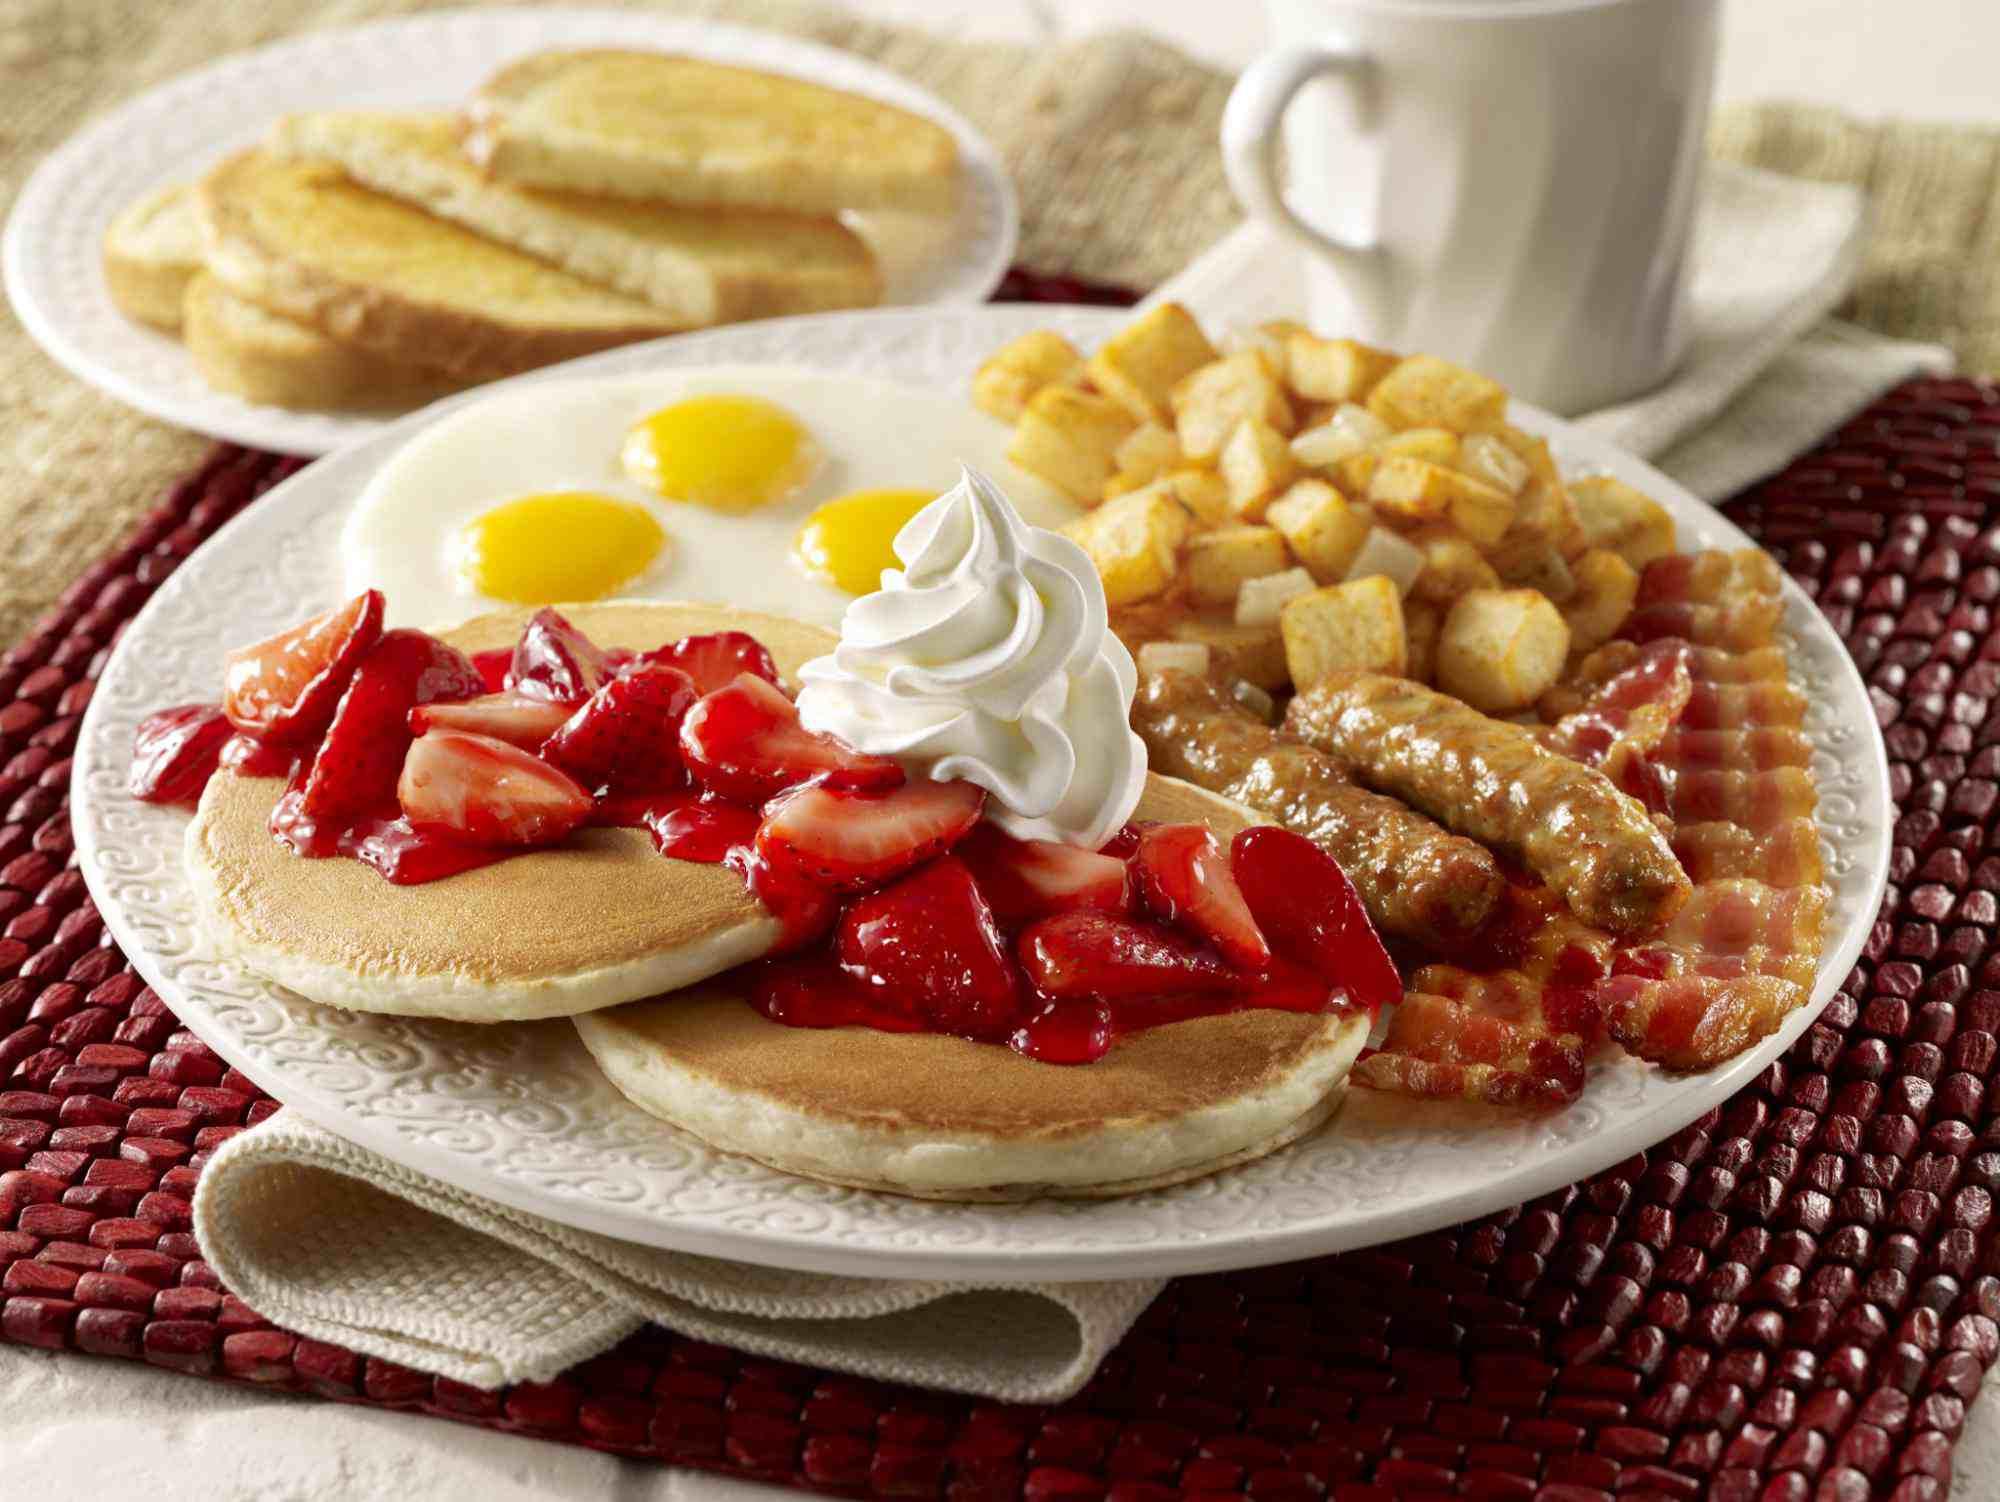 Desayuno de panqueques de fresa